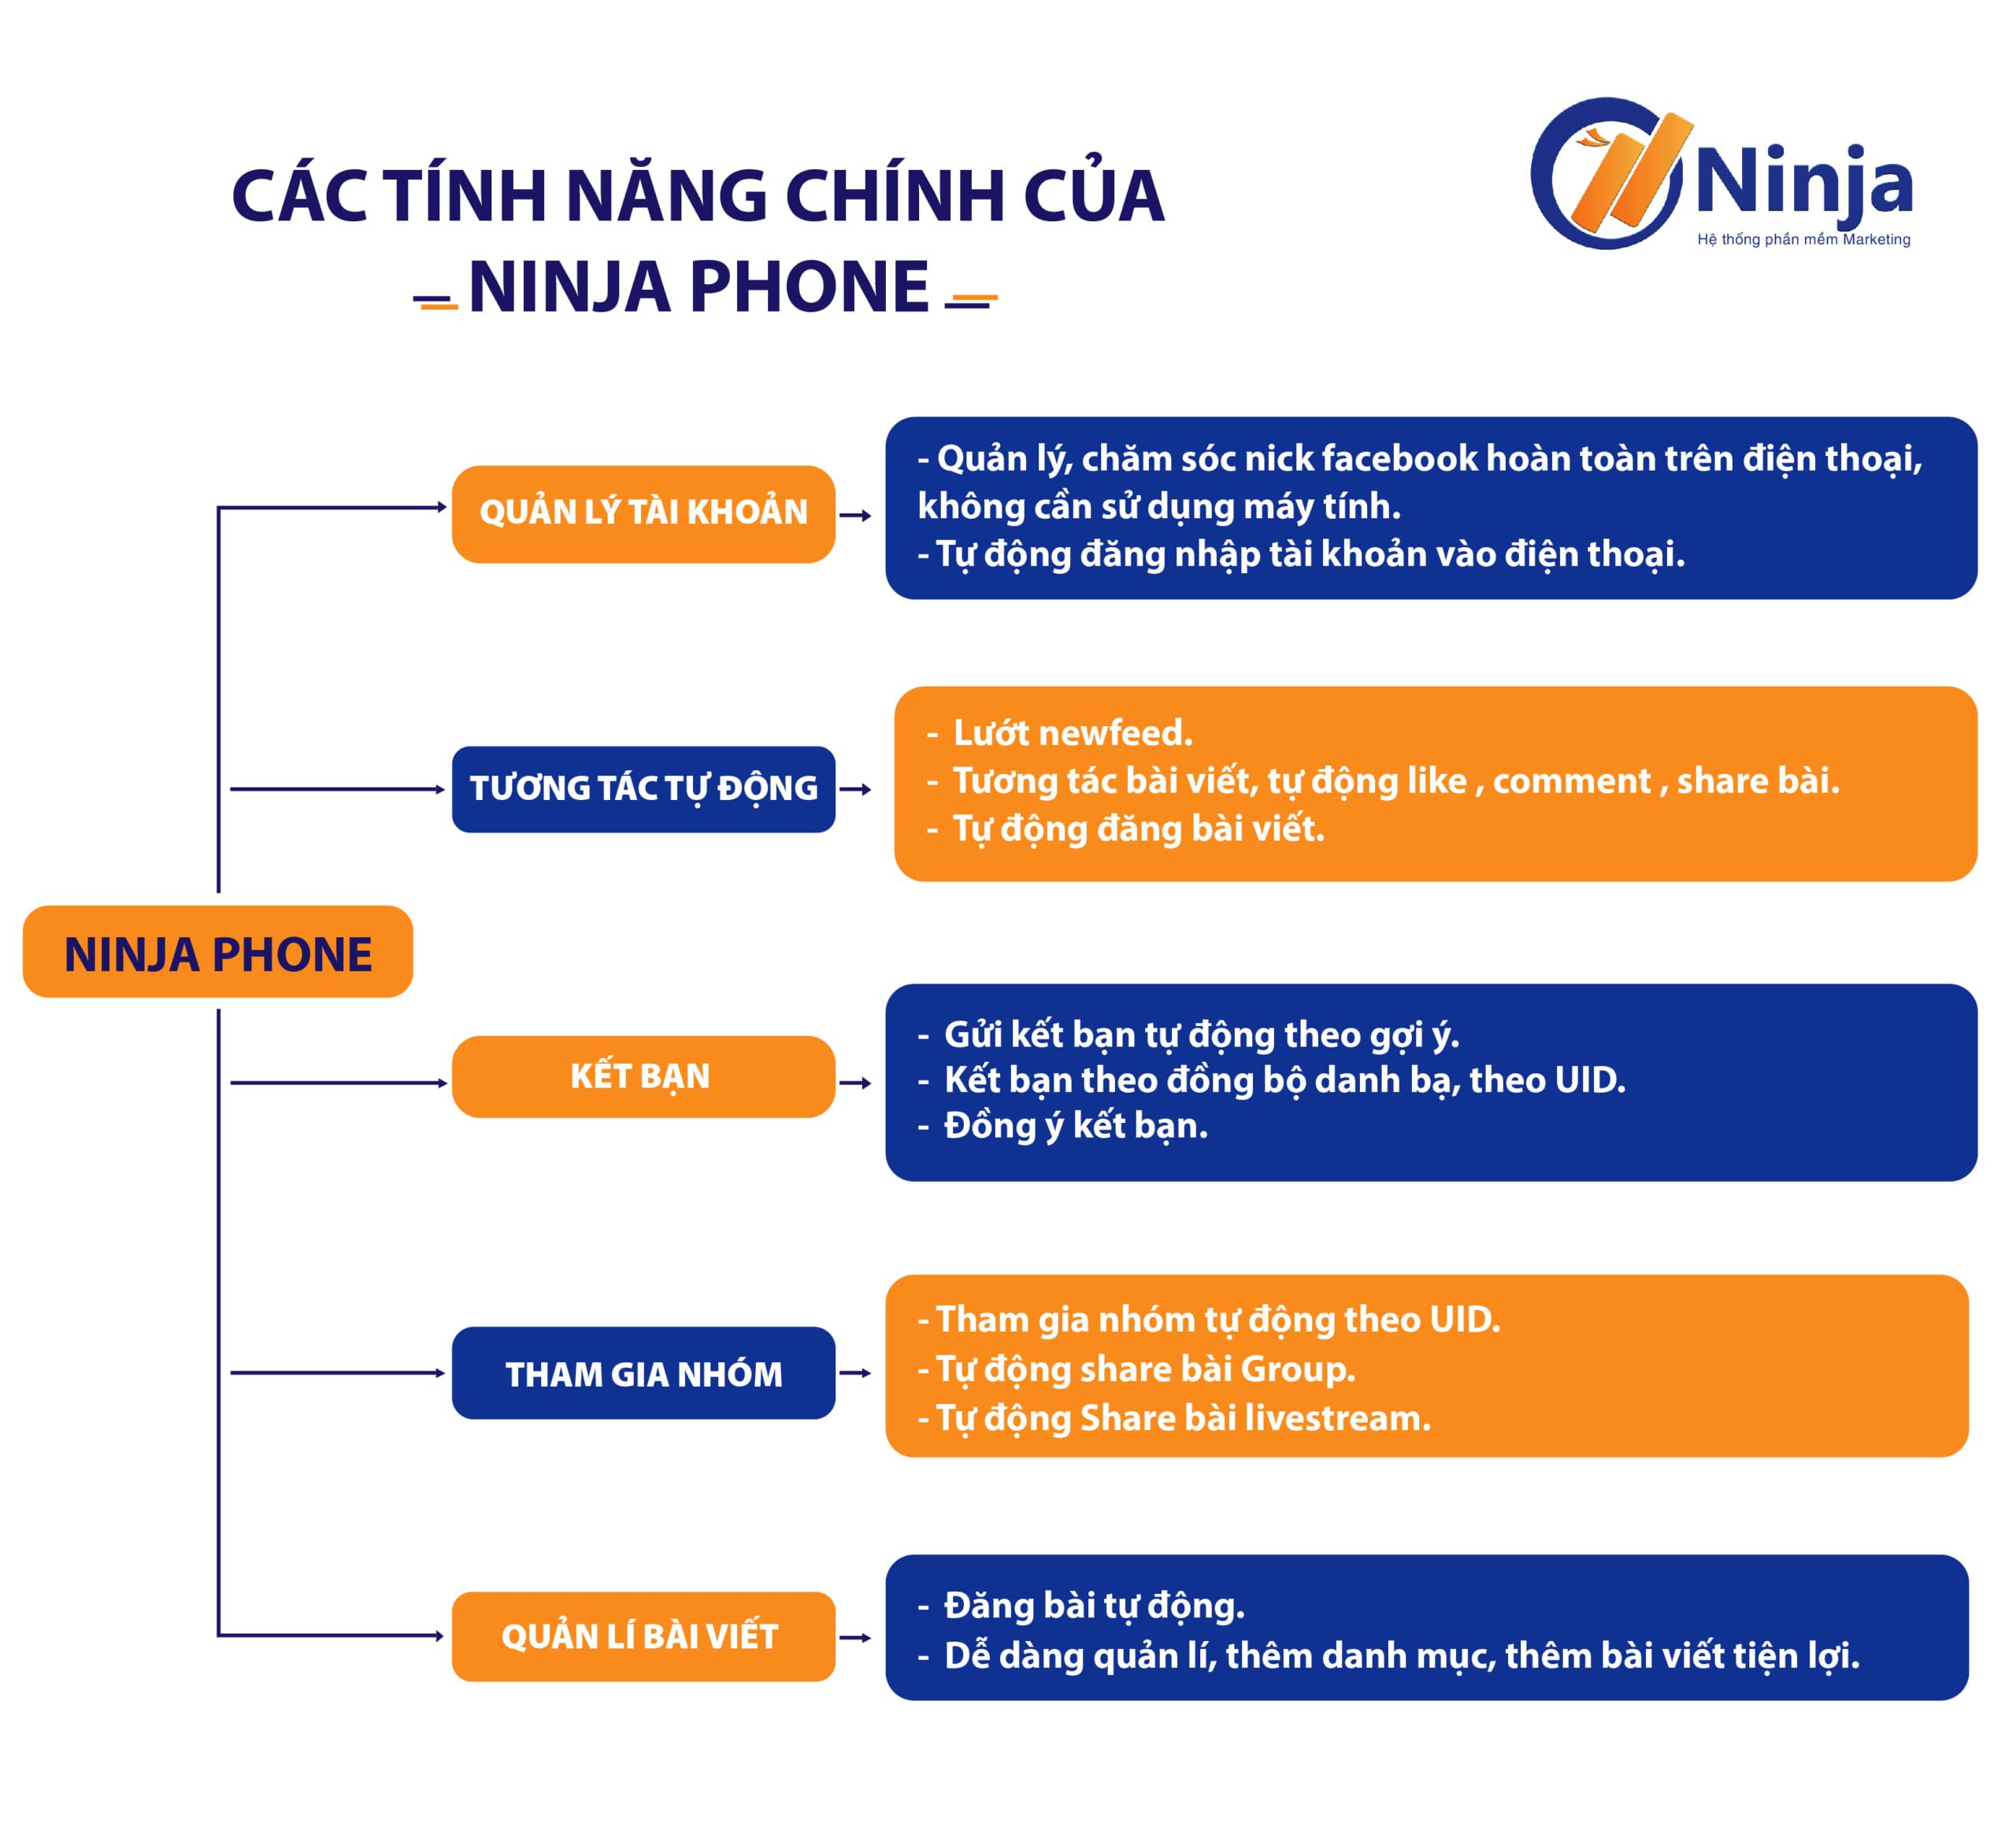 ninja-phone-phan-mem-nuoi-nick-dien-thoai-tu-dong-tien-ich